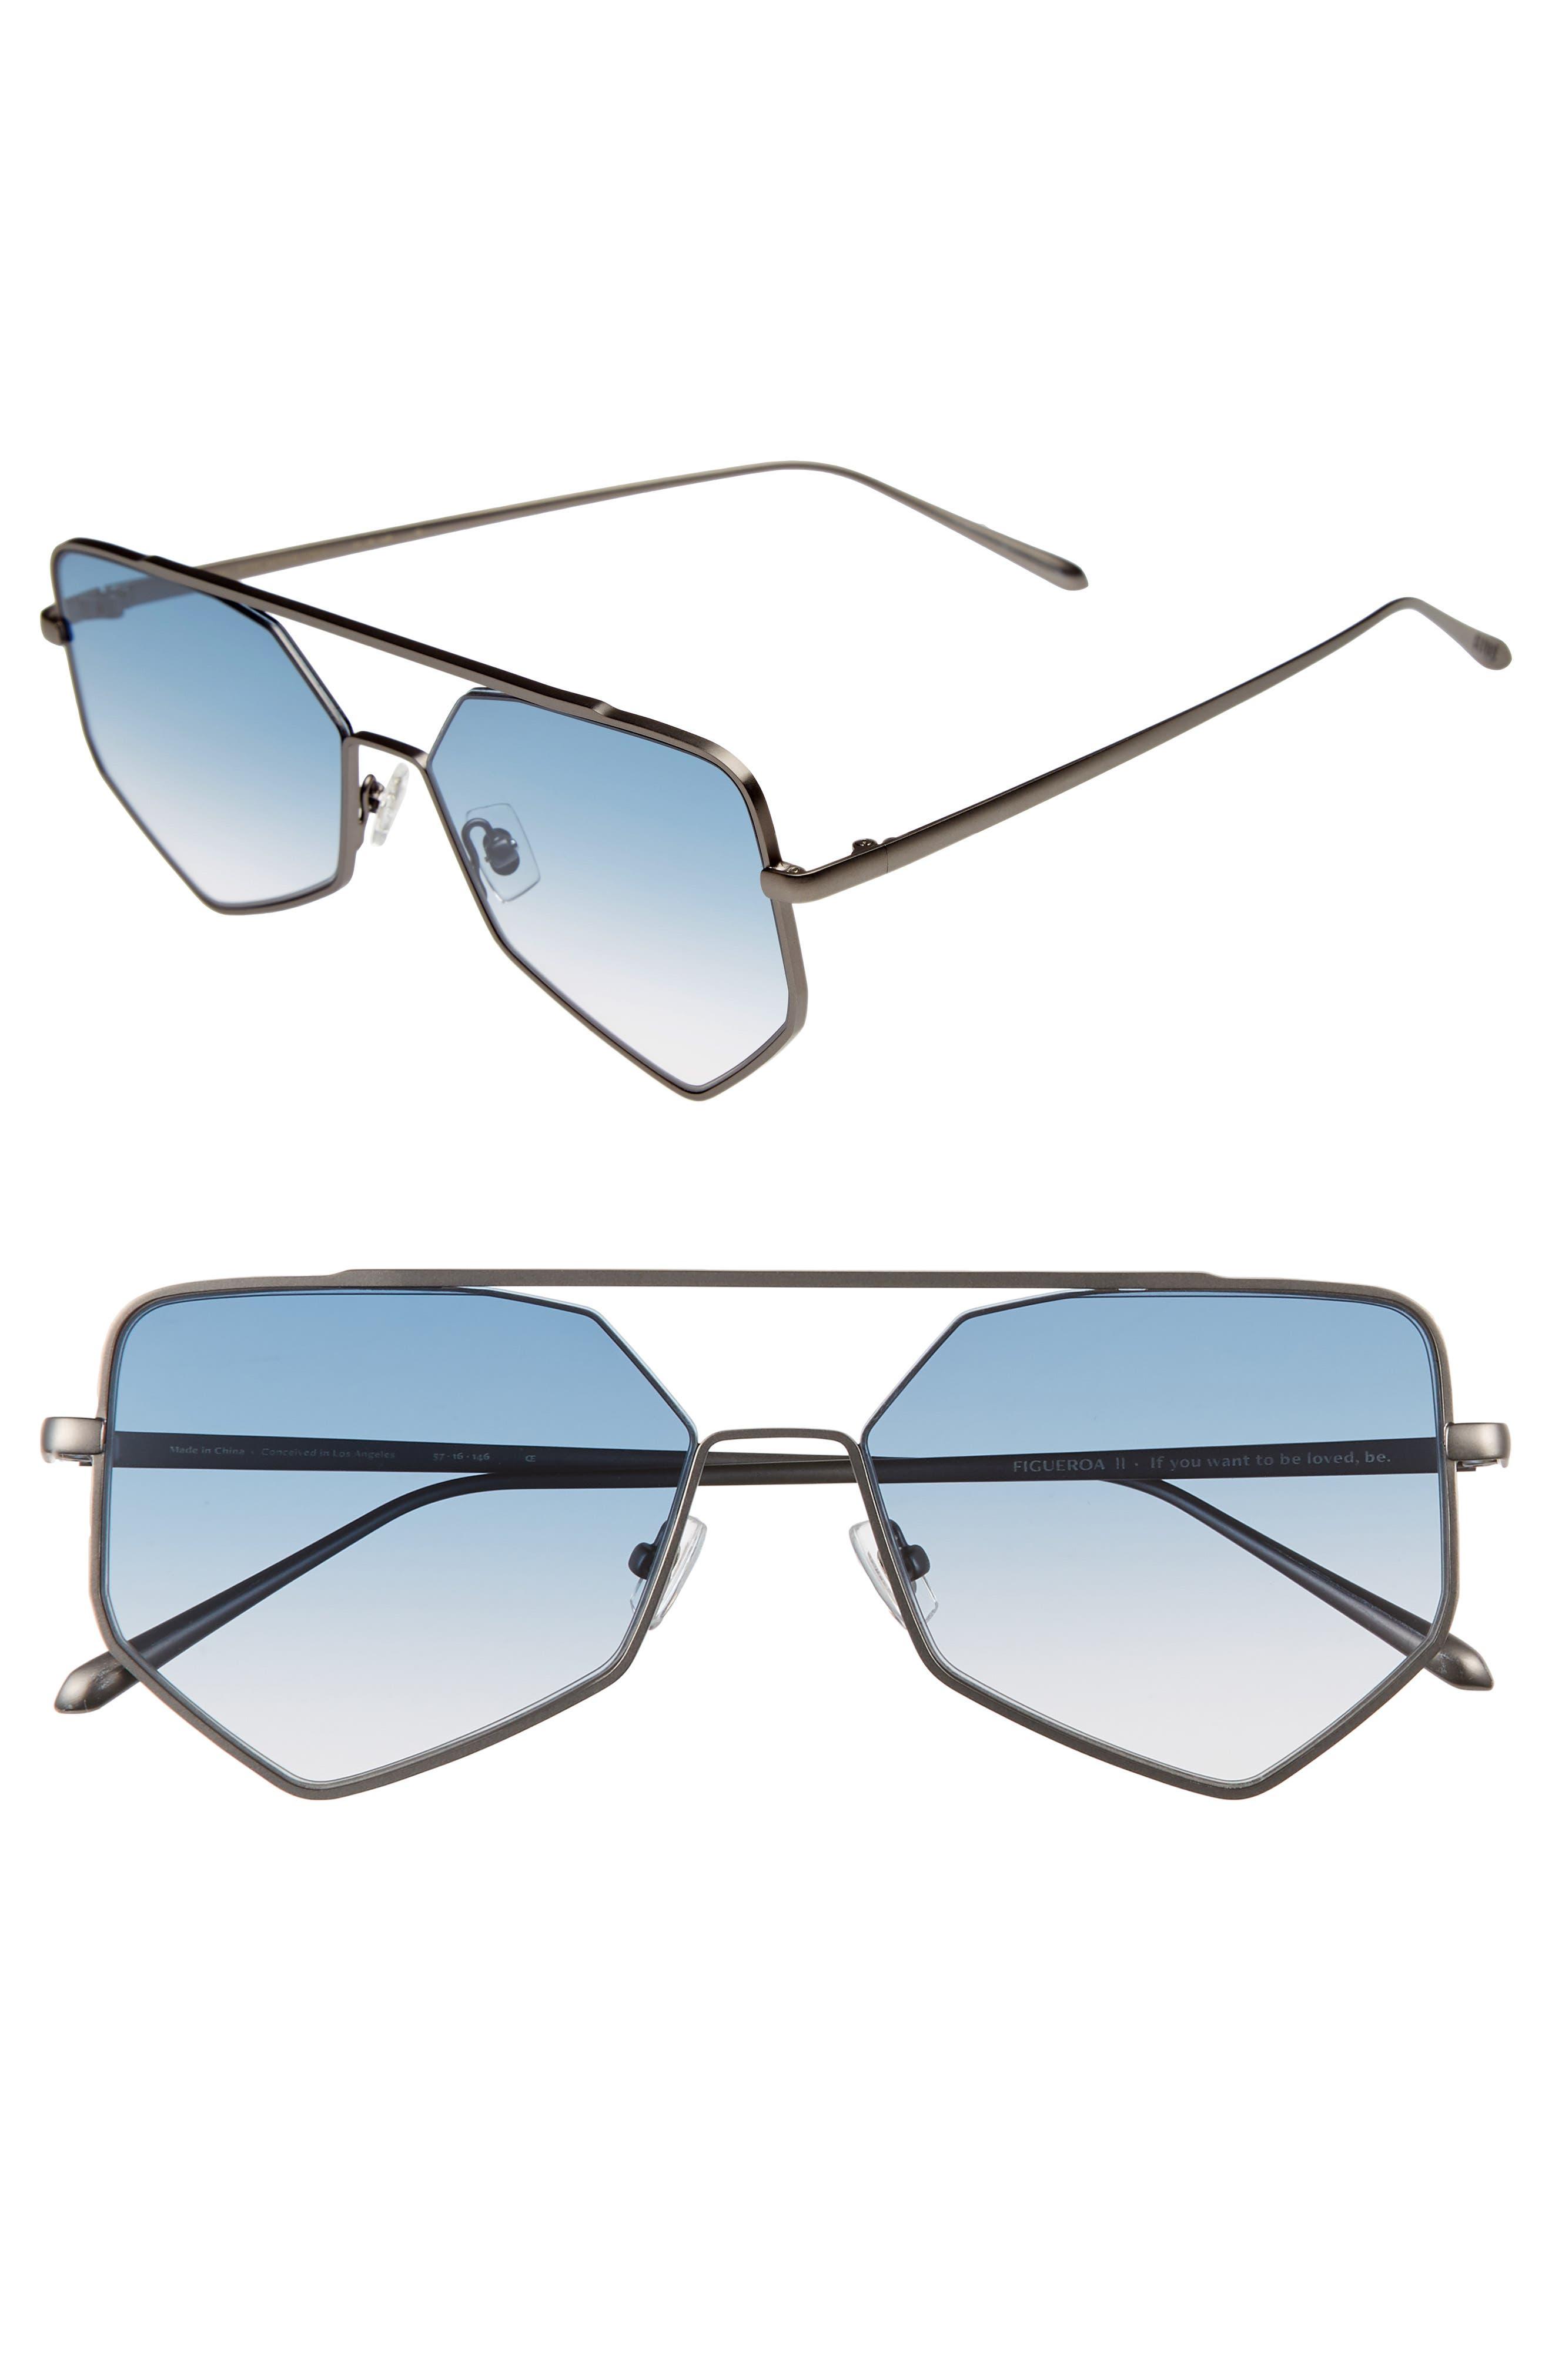 ee5fb3825a166 Women s Sunglasses Sale